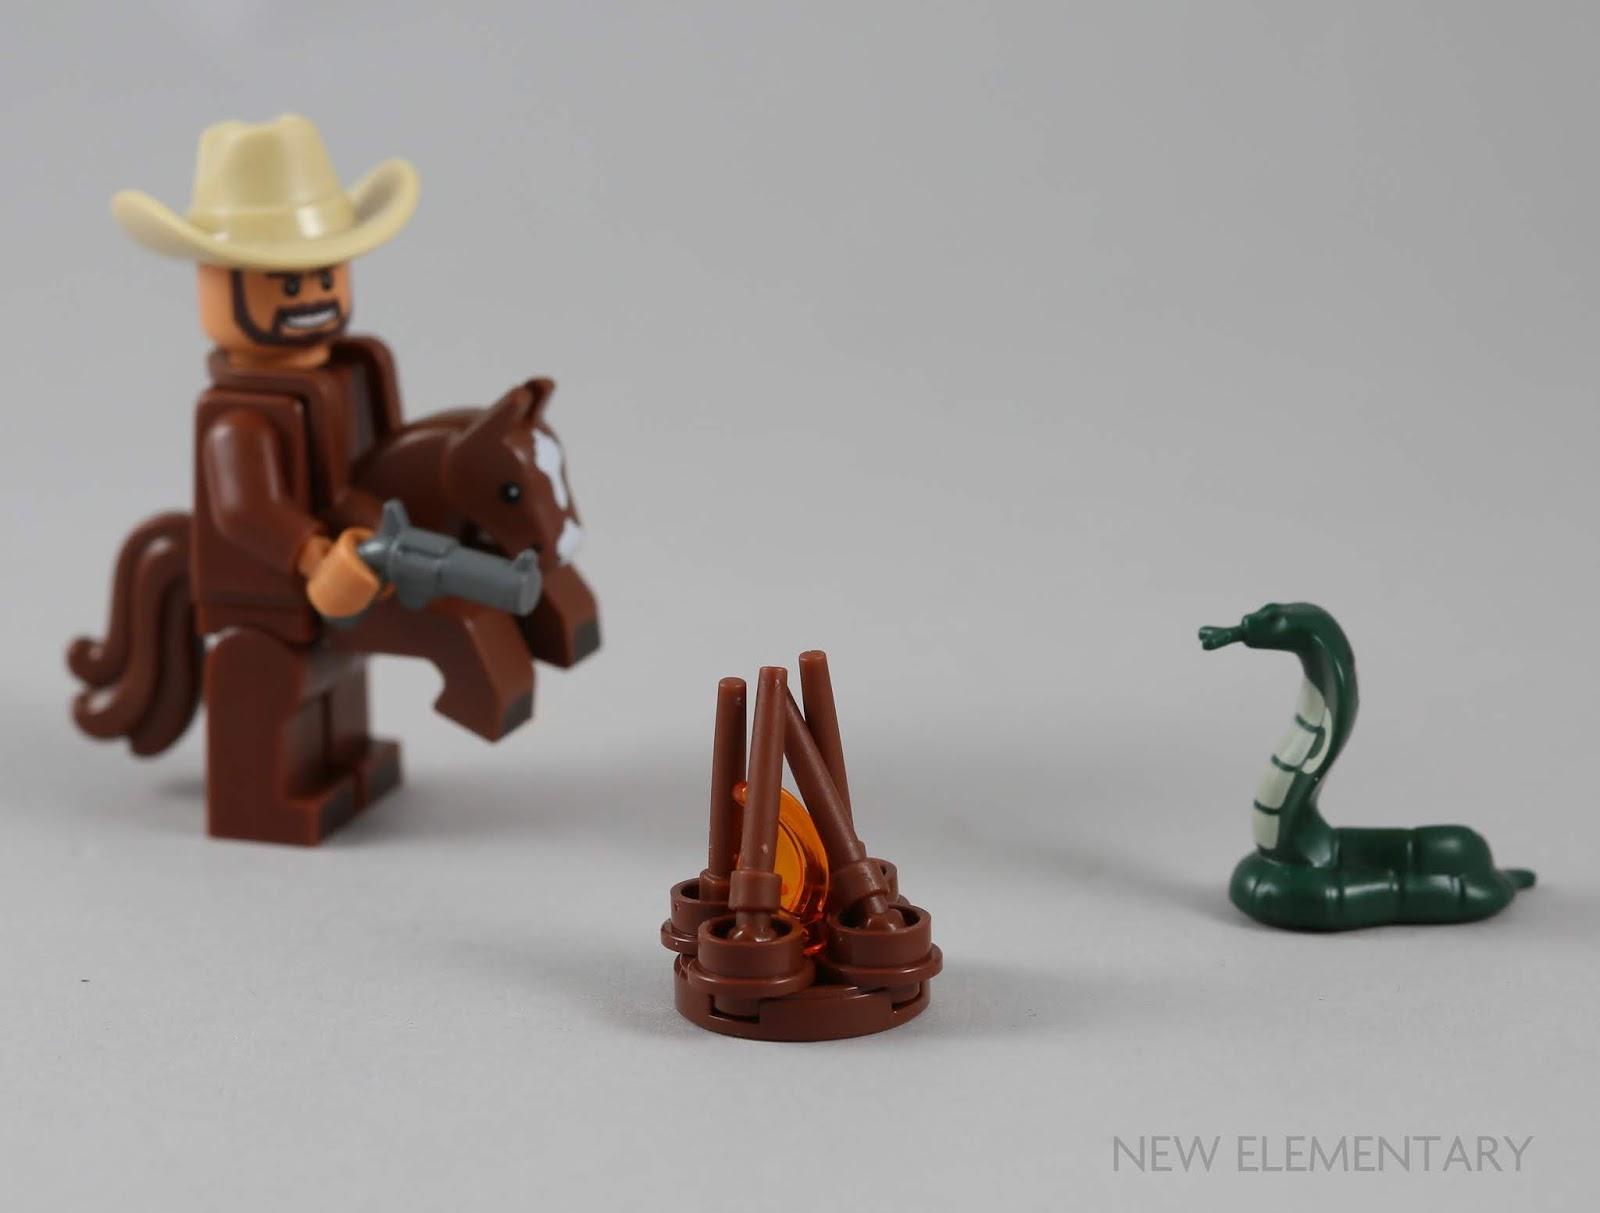 lego® harry potter: a wanderful new element | new elementary, a lego